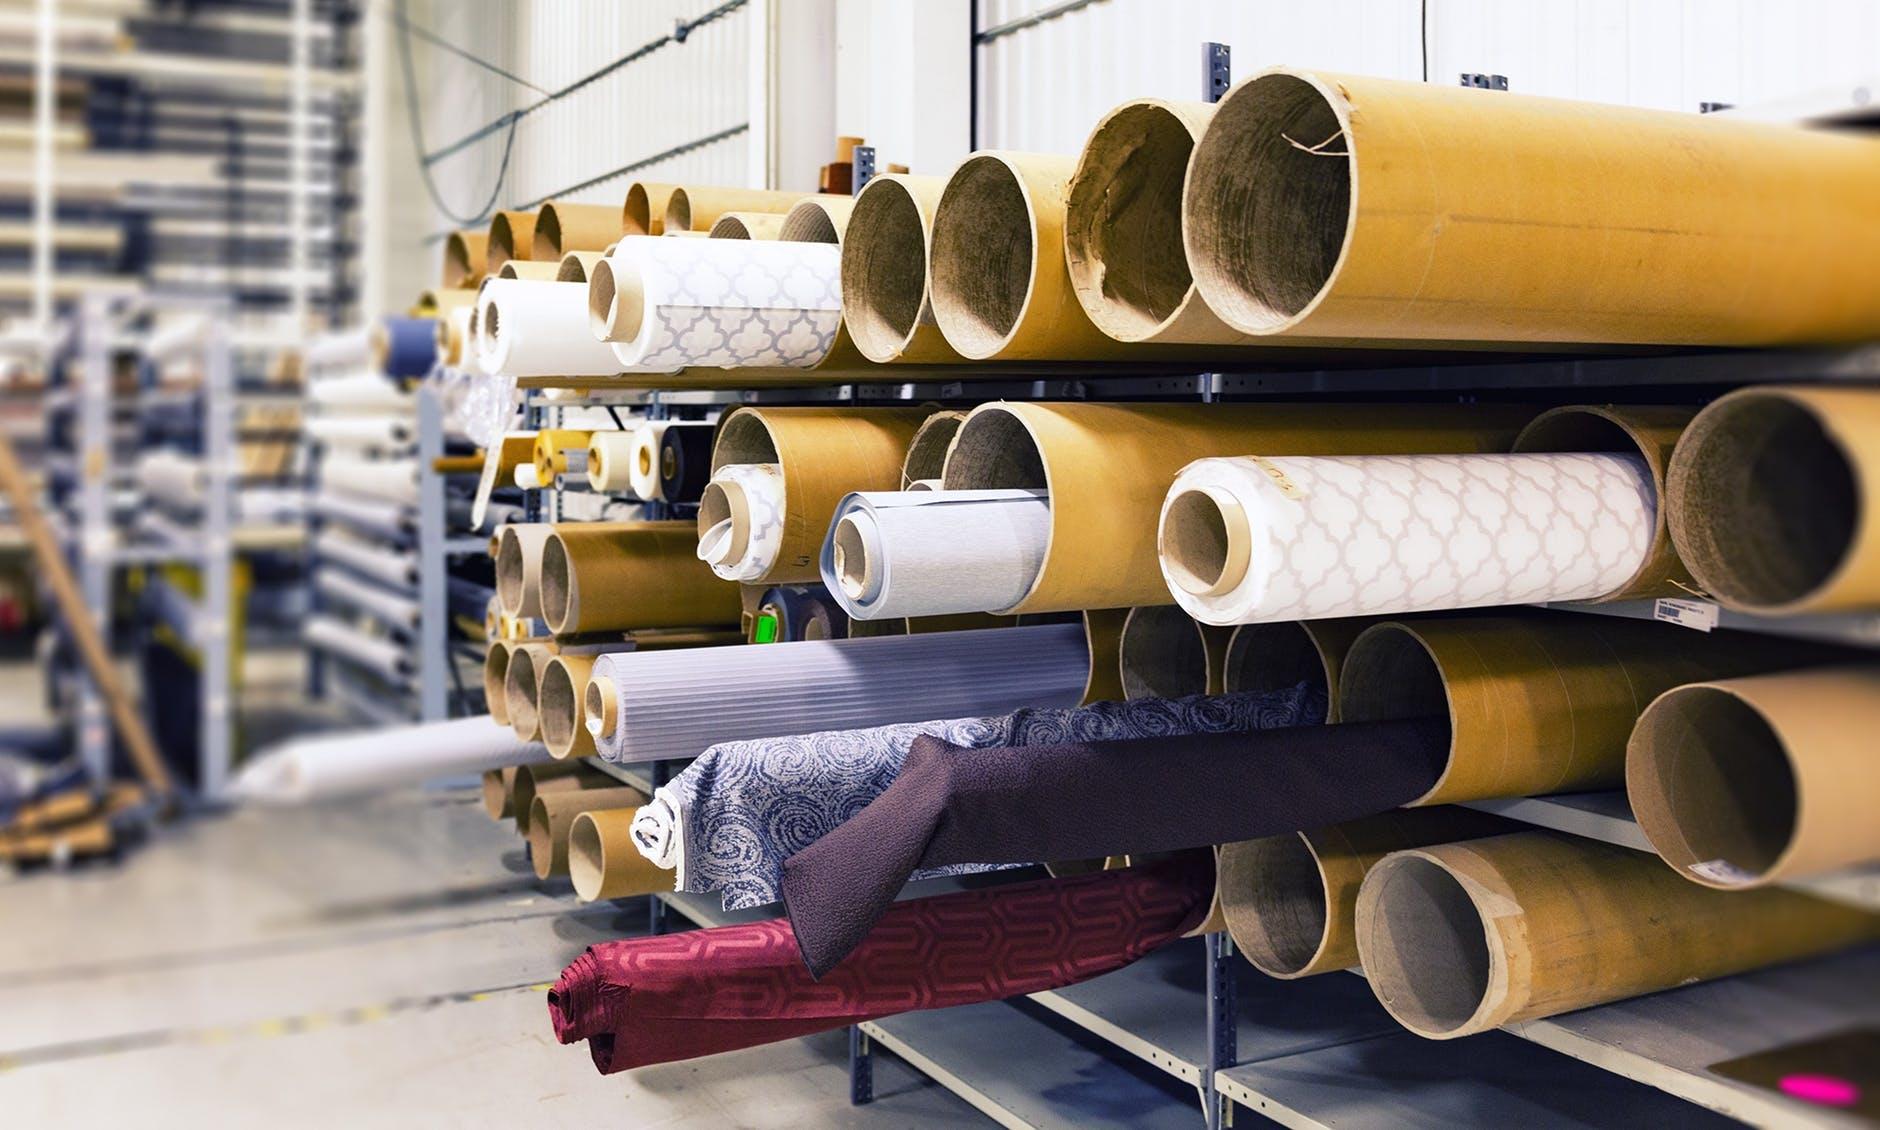 Intip Profil SRIL Saham, Sang Penguasa Industri Tekstil